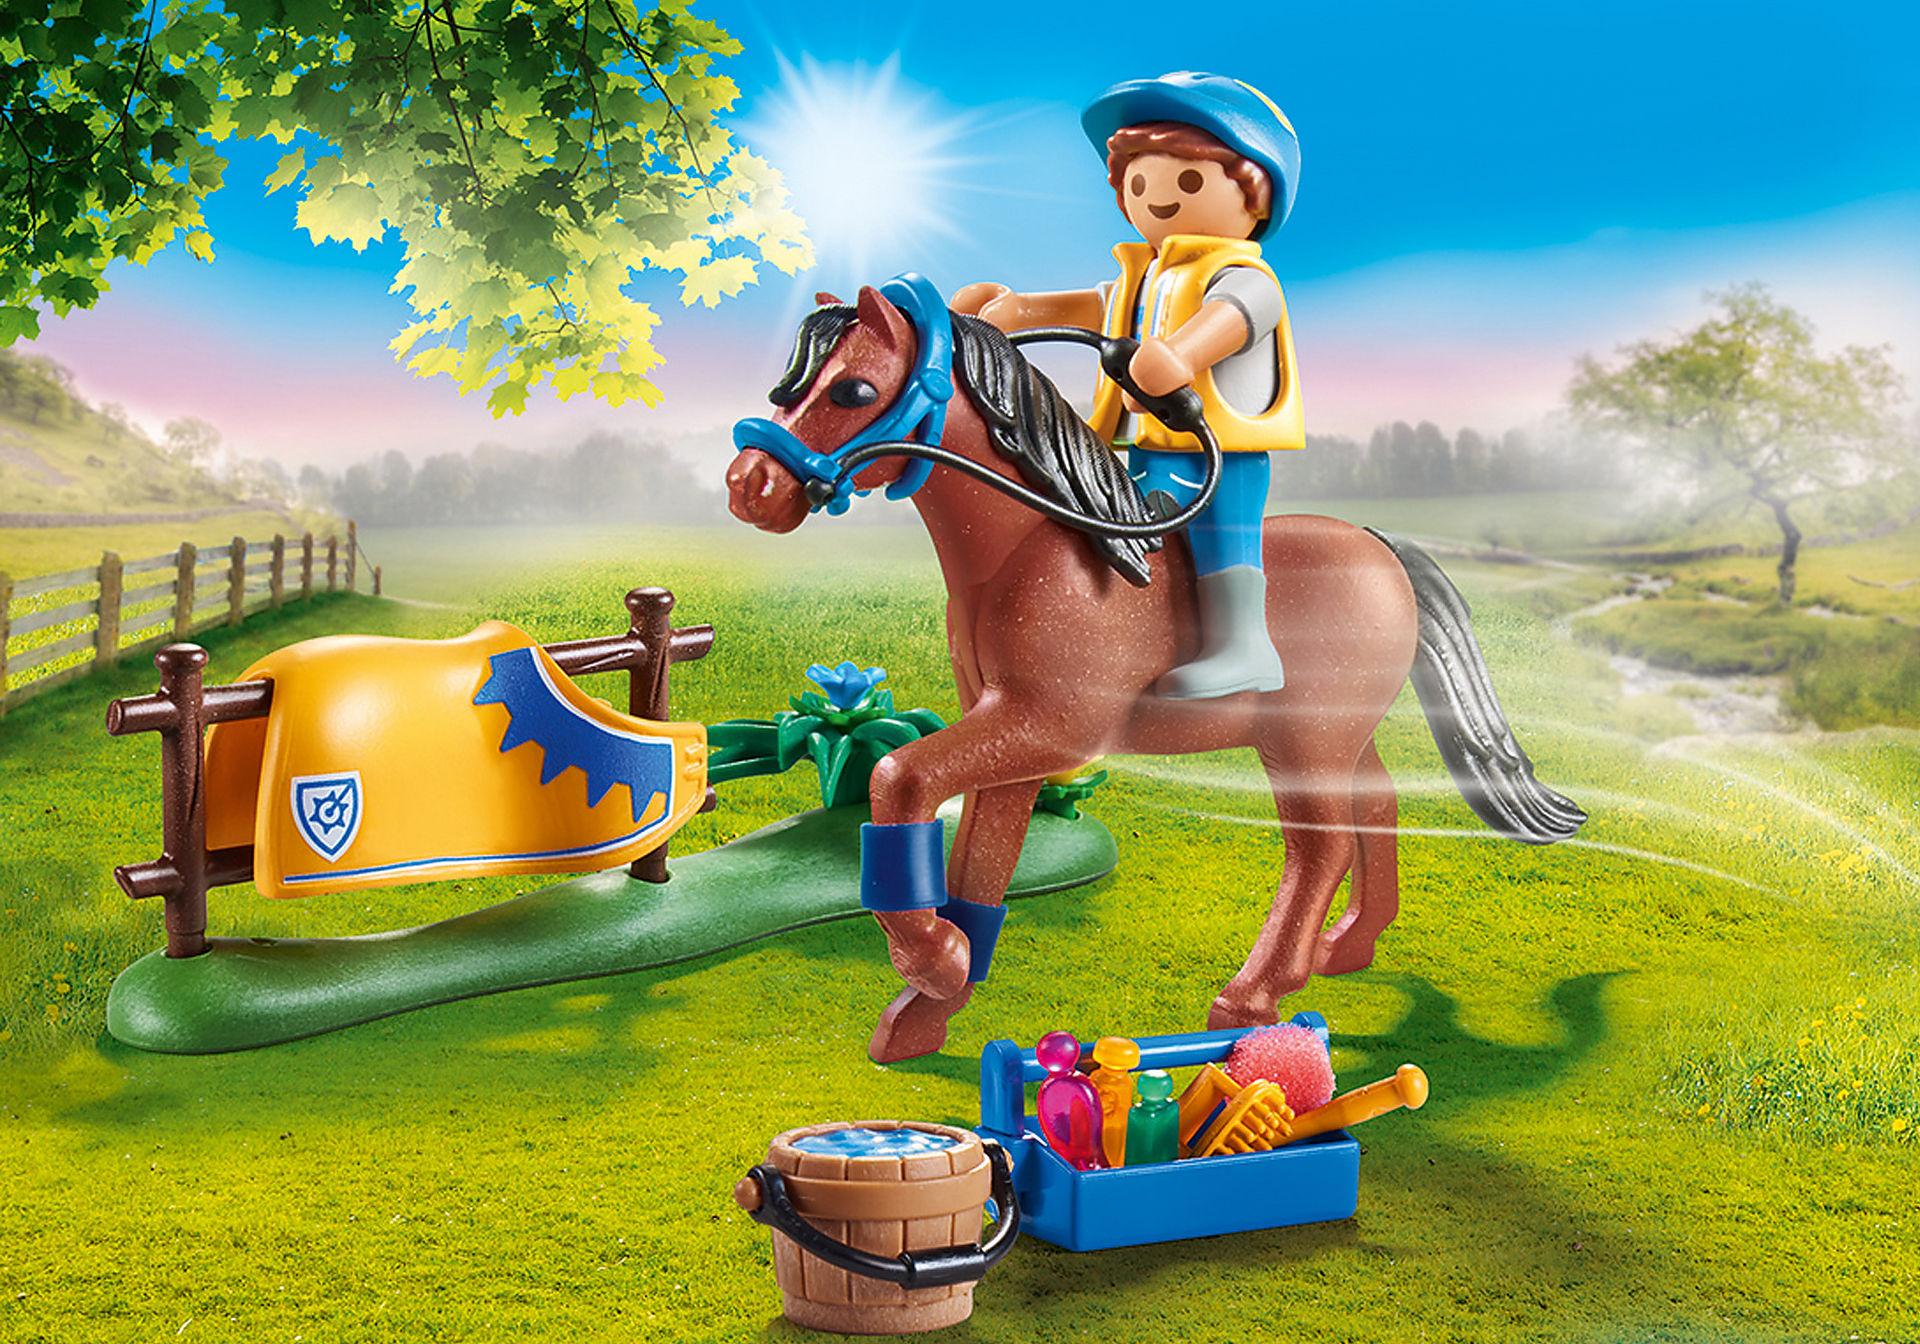 70523 Welsh-pony samlerobjekt zoom image1